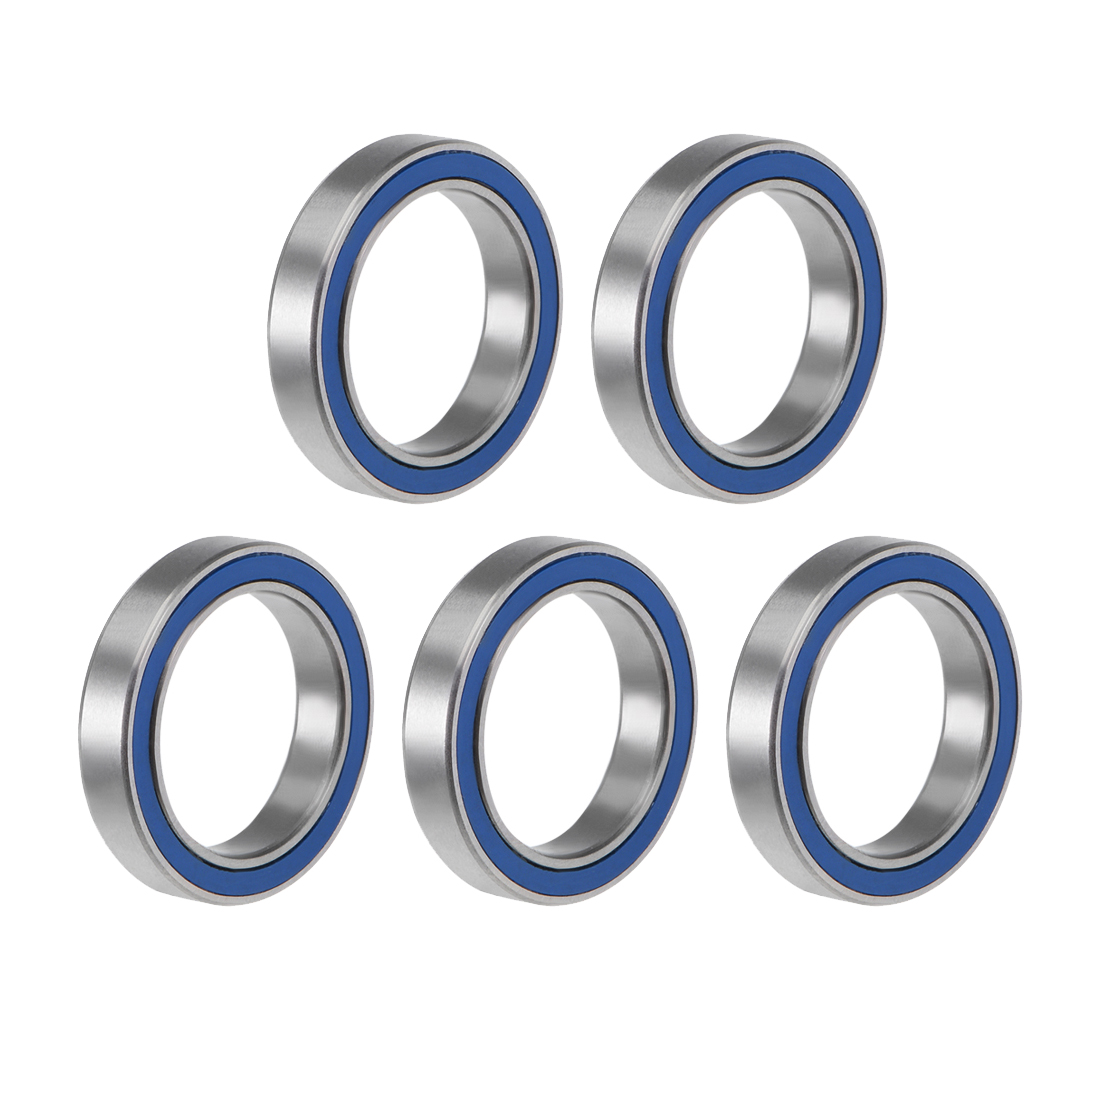 6702-2RS Ball Bearing 15x21x4mm Double Sealed ABEC-3 Bearings 5pcs